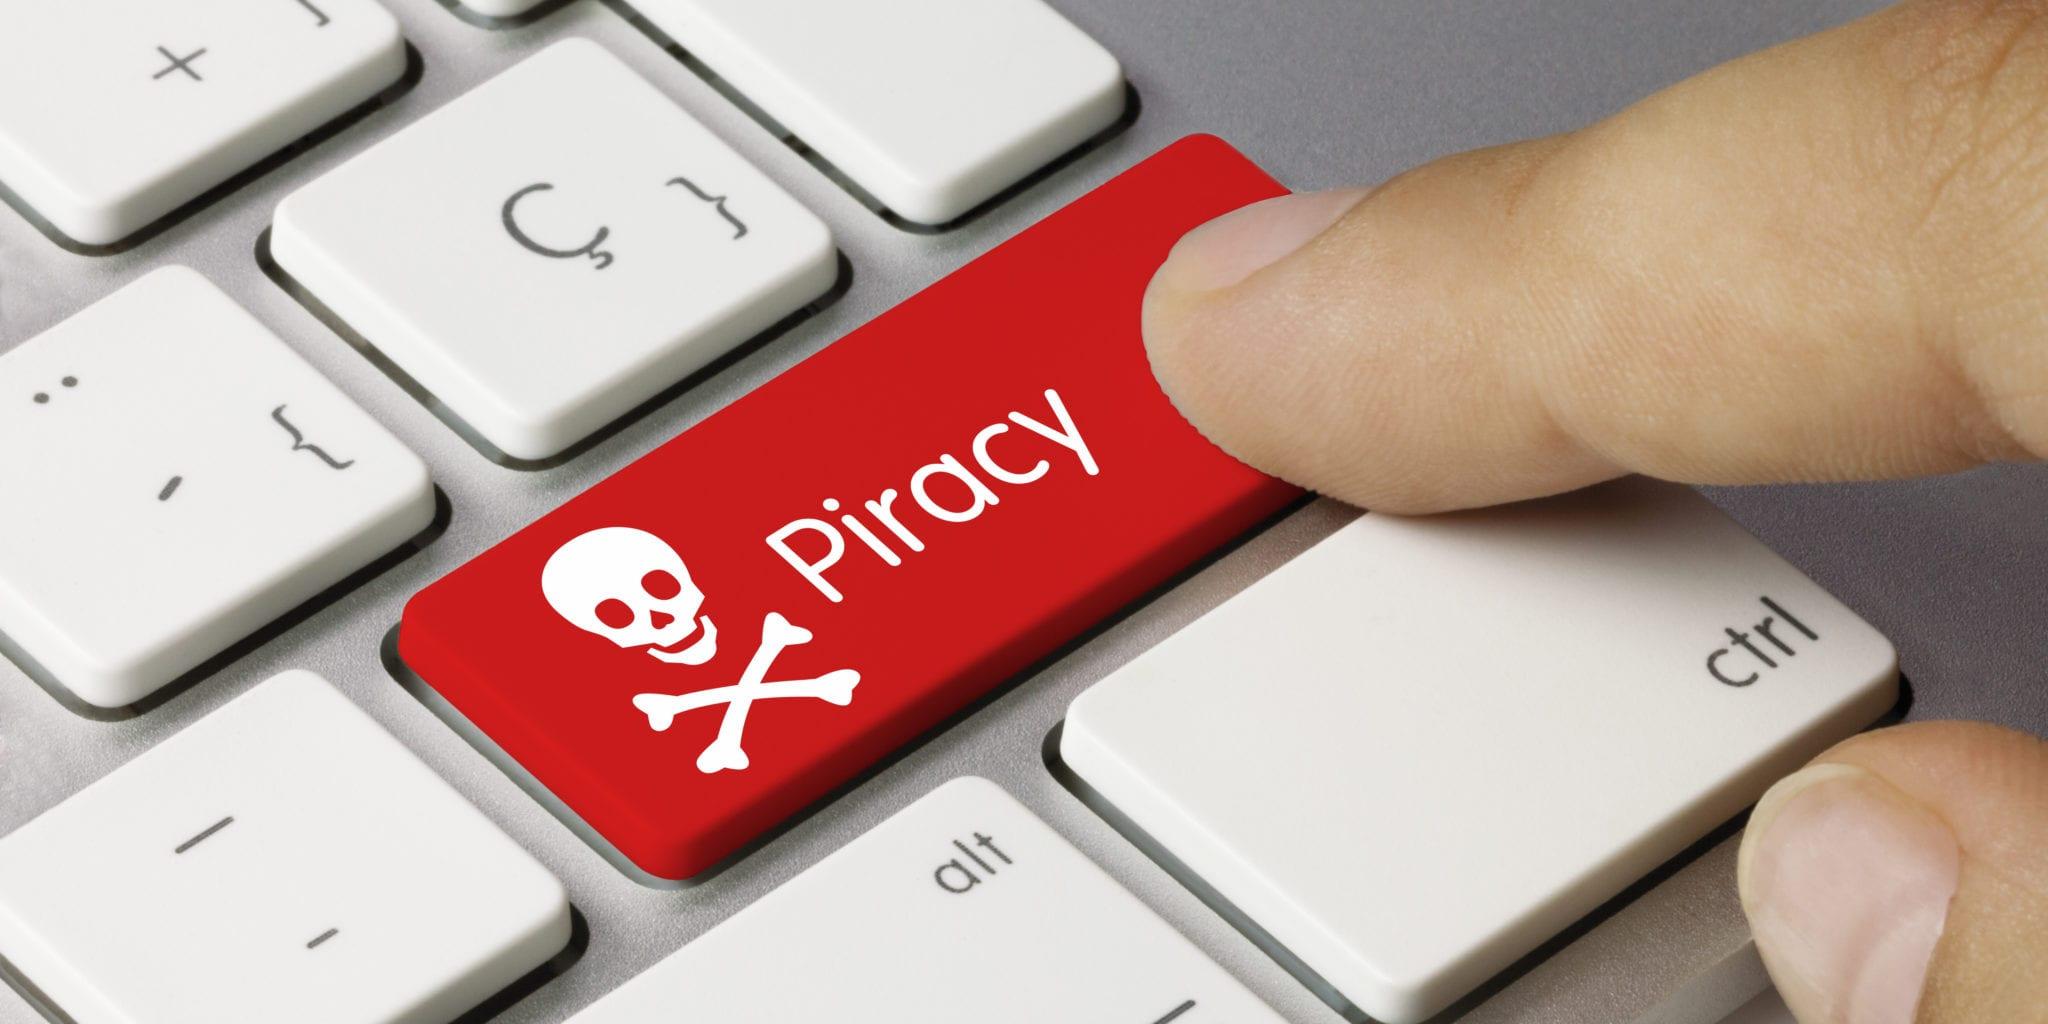 music piracy, music leaks, leaked music, digital piracy, music business, music biz, music industry